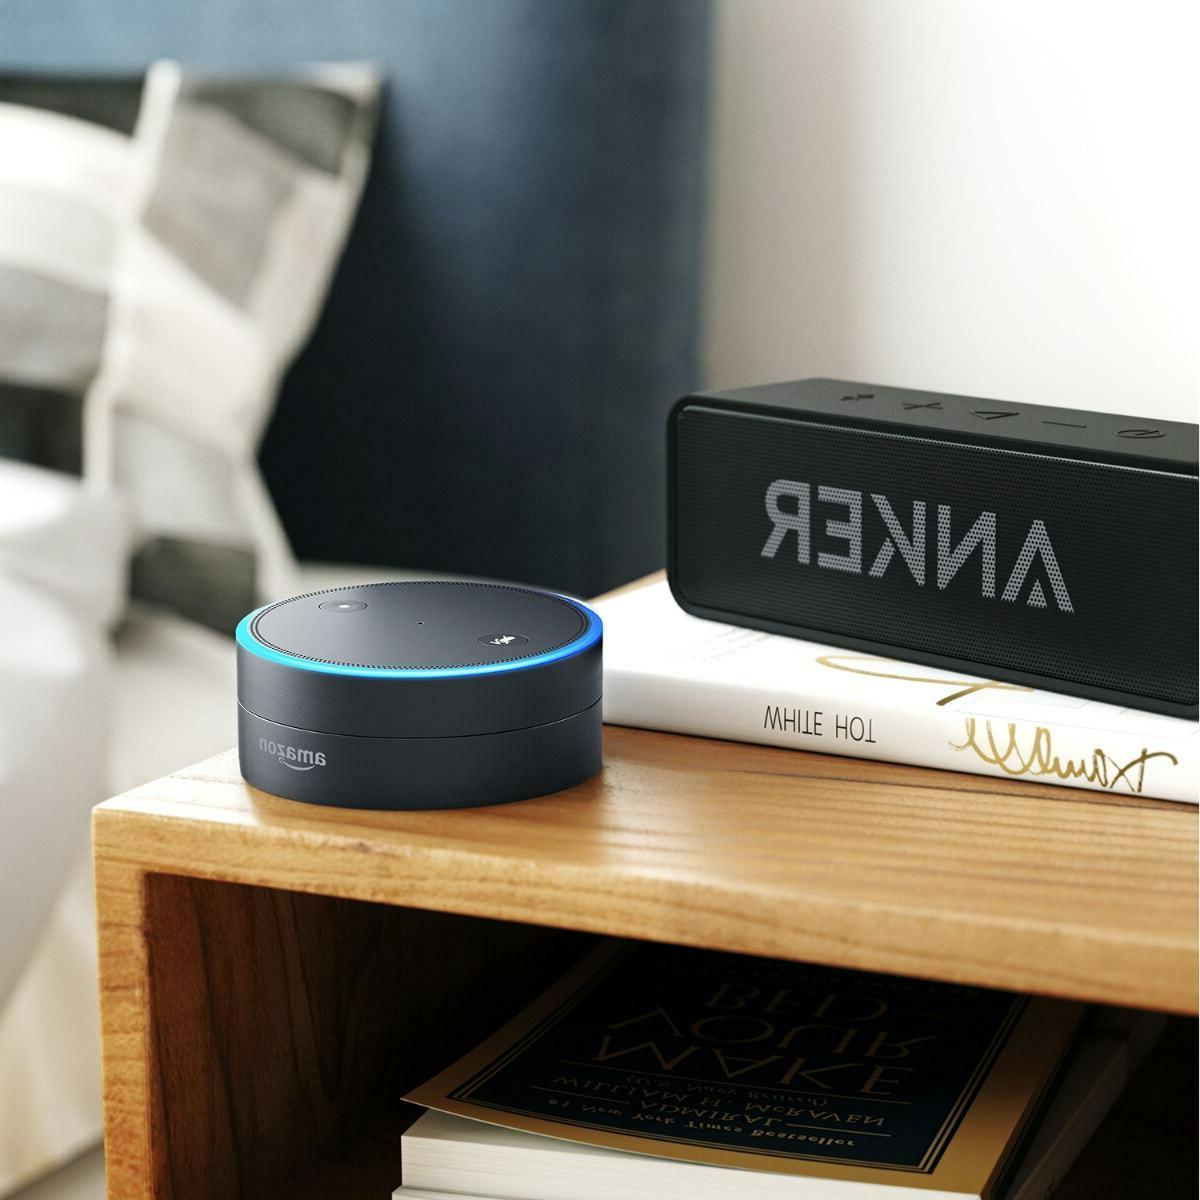 Anker Soundcore Bluetooth Speaker Loud Stereo Sound Playtime 66ft